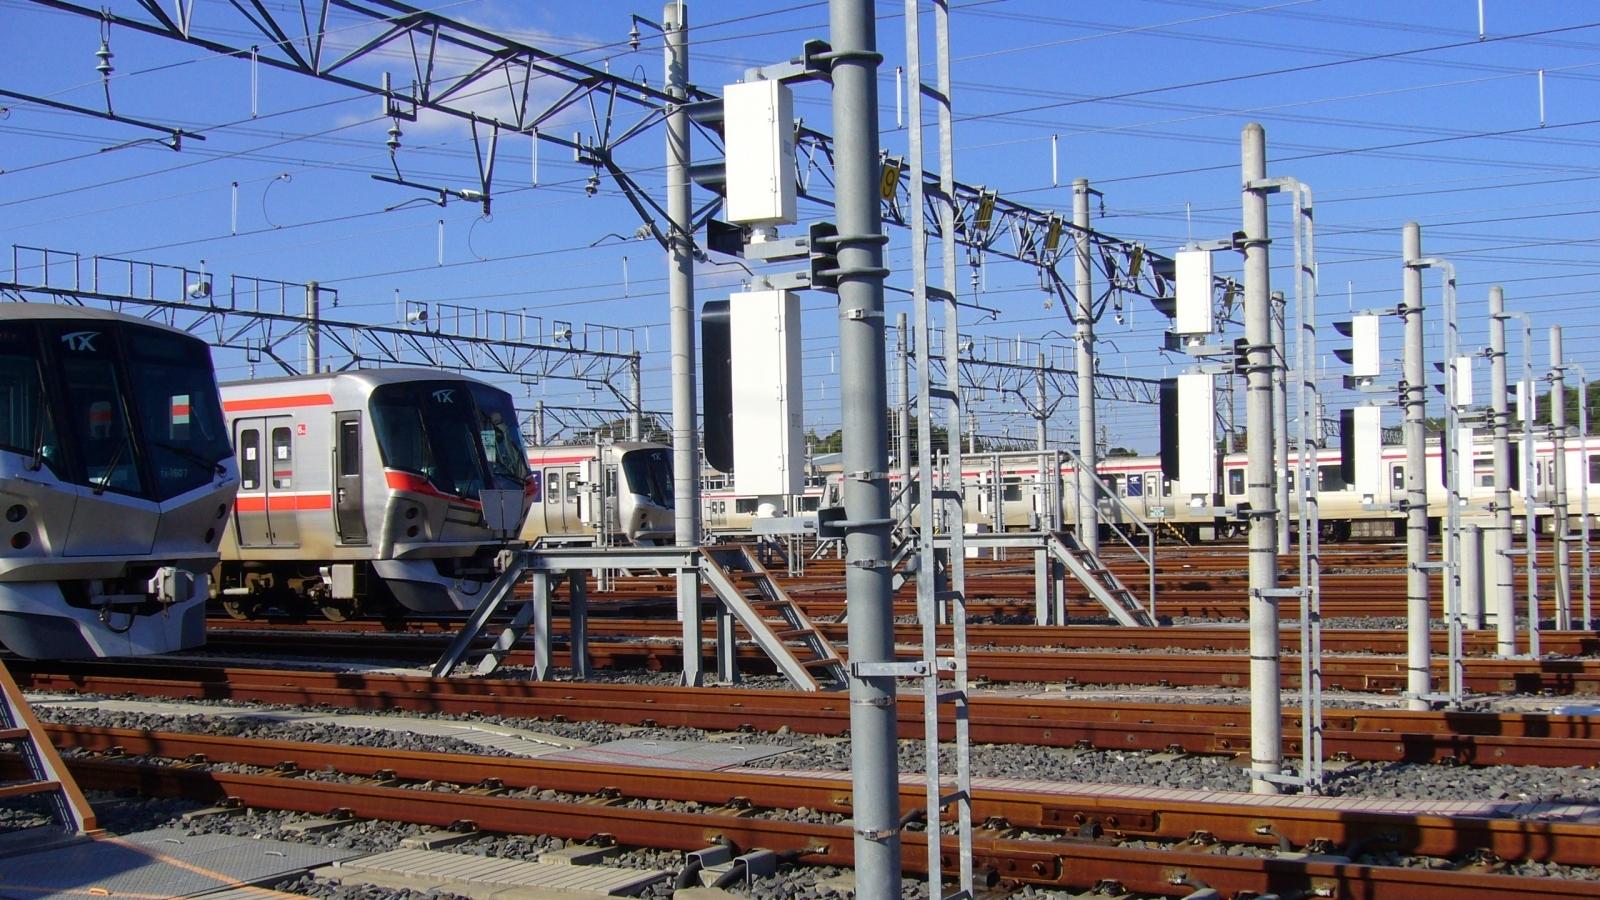 Tsukuba Express General Depot